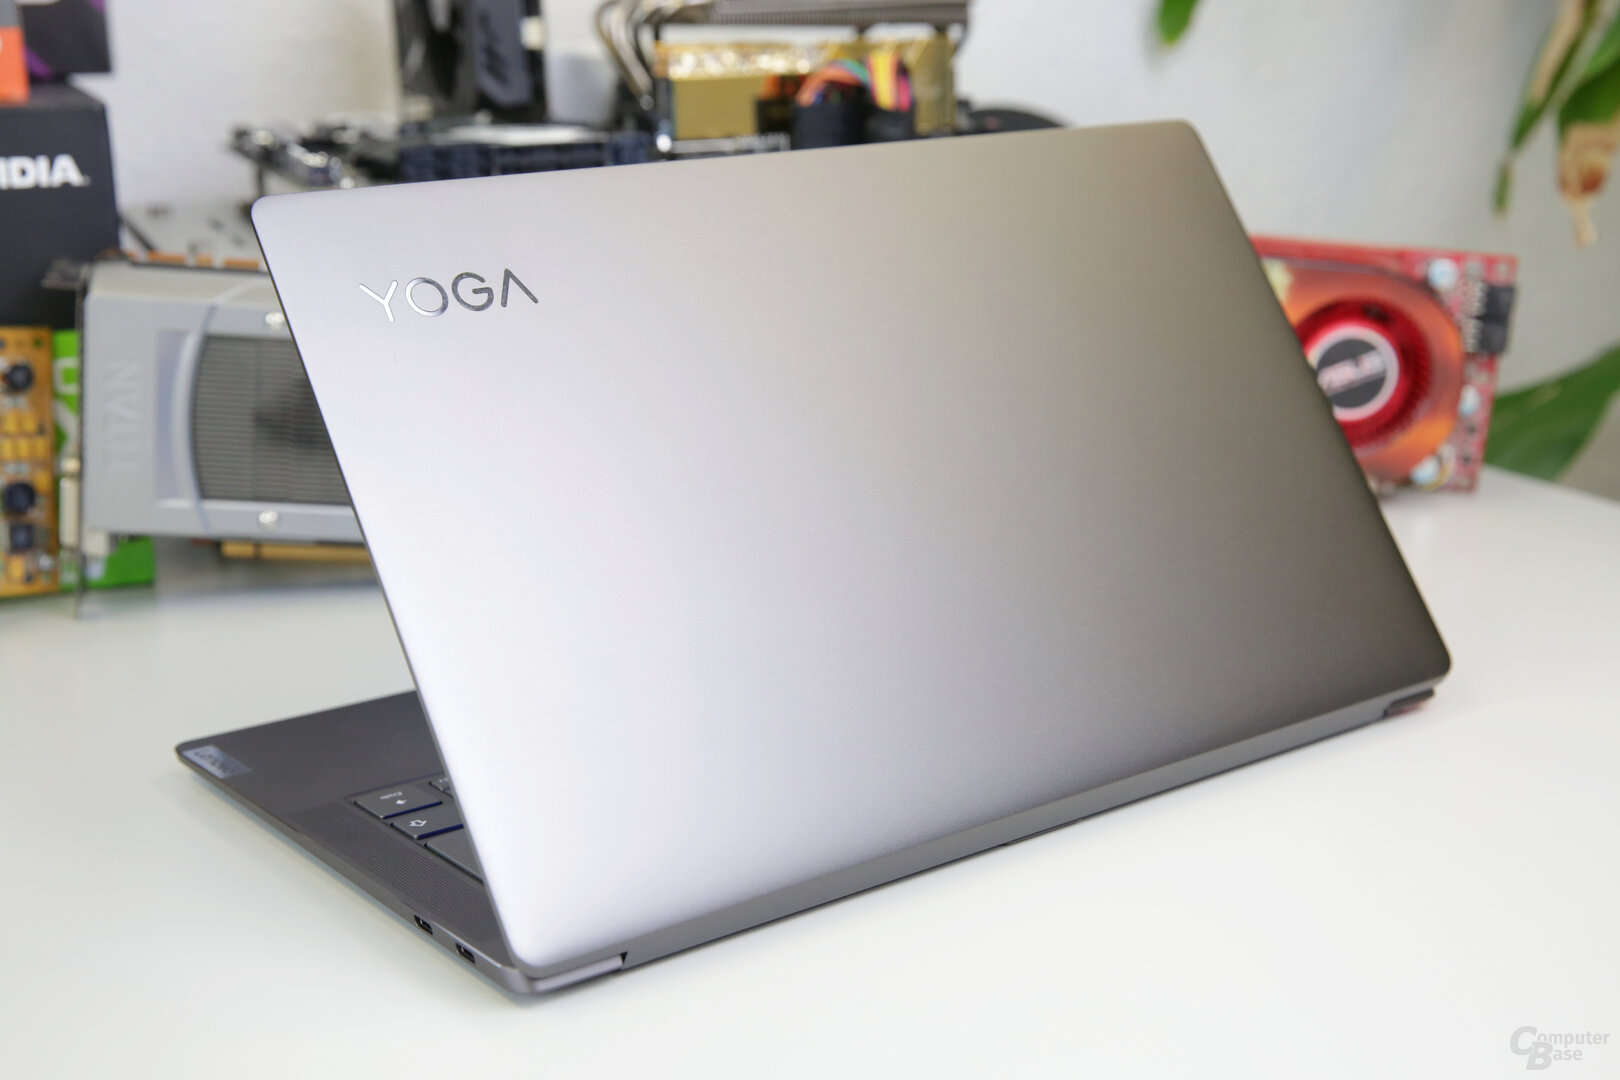 Das Yoga S940 kommt in sandgestrahltem Aluminium